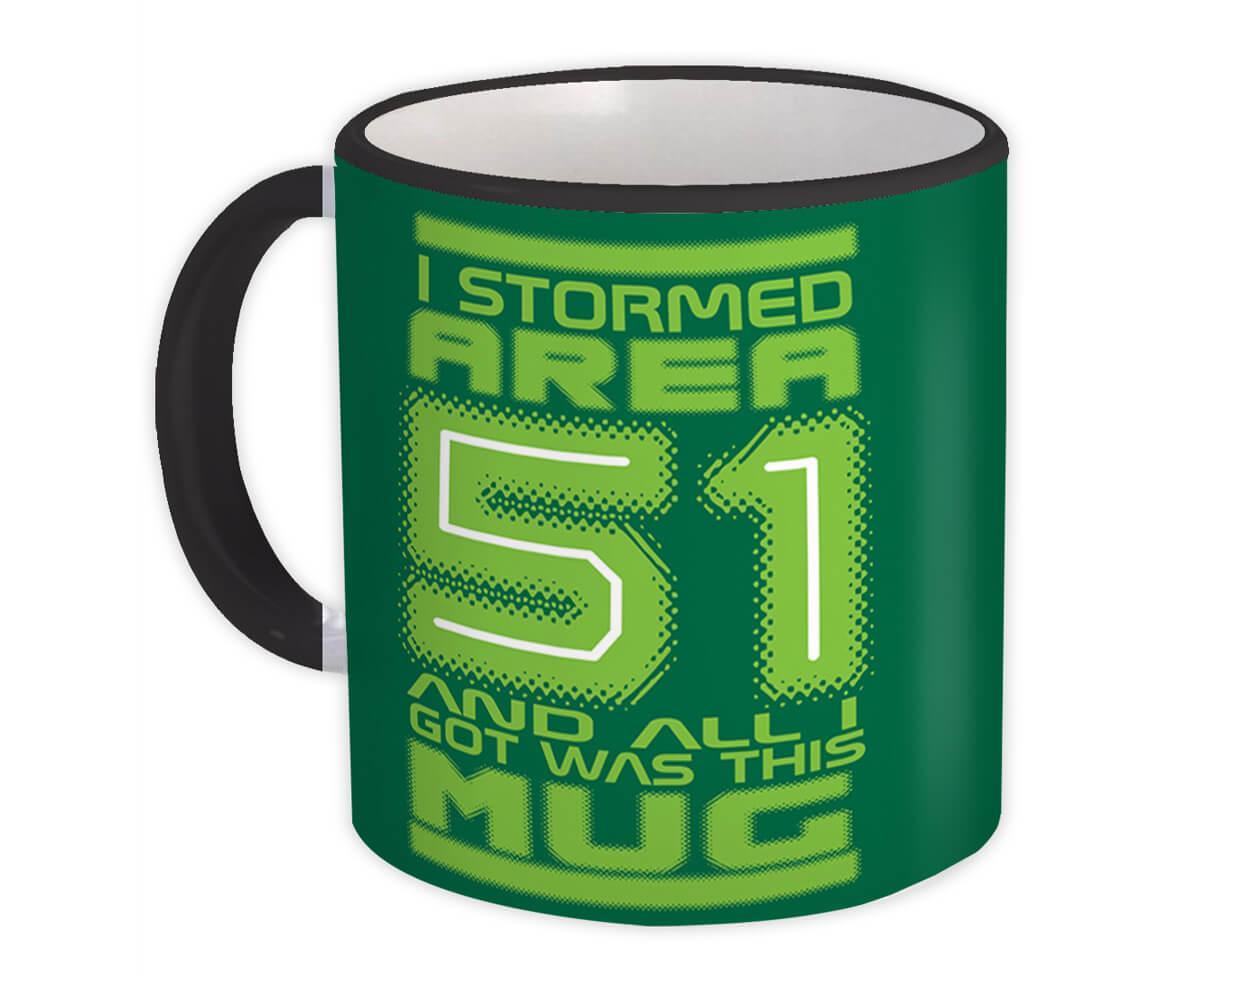 I Stormed Area 51 : Gift Mug Alien Geek Storm Mars Nasa Science Fiction Day Sci-FI